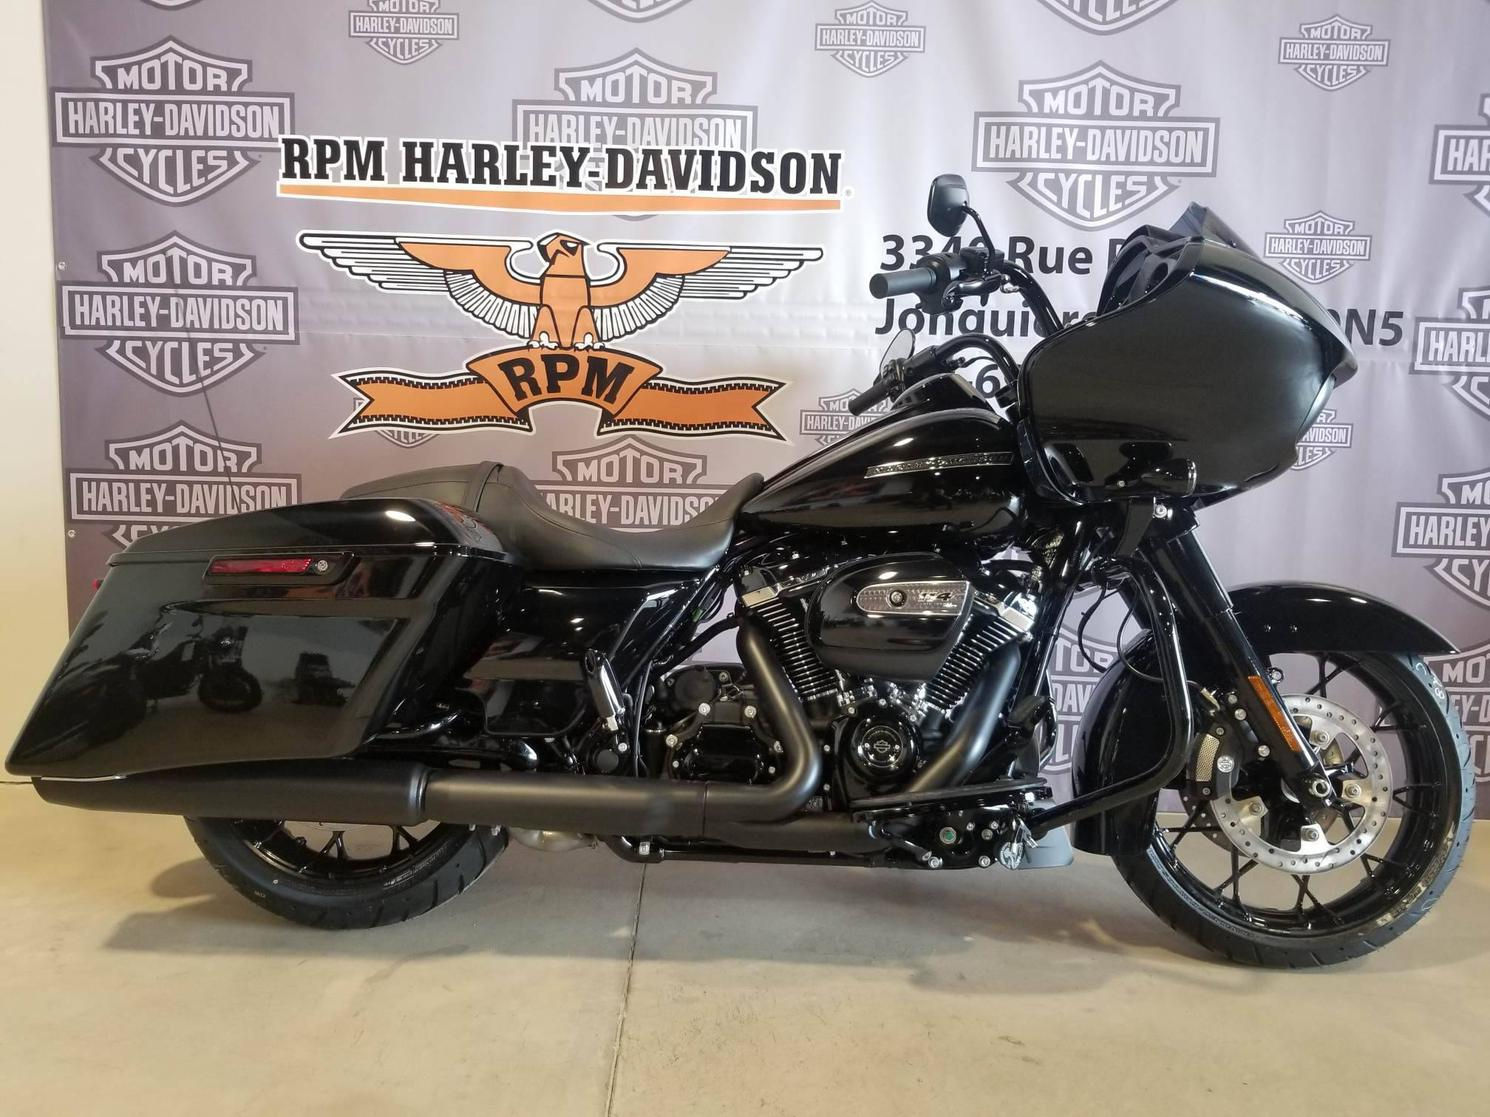 Harley-Davidson Road Glide Special 2020 - FLTRXS